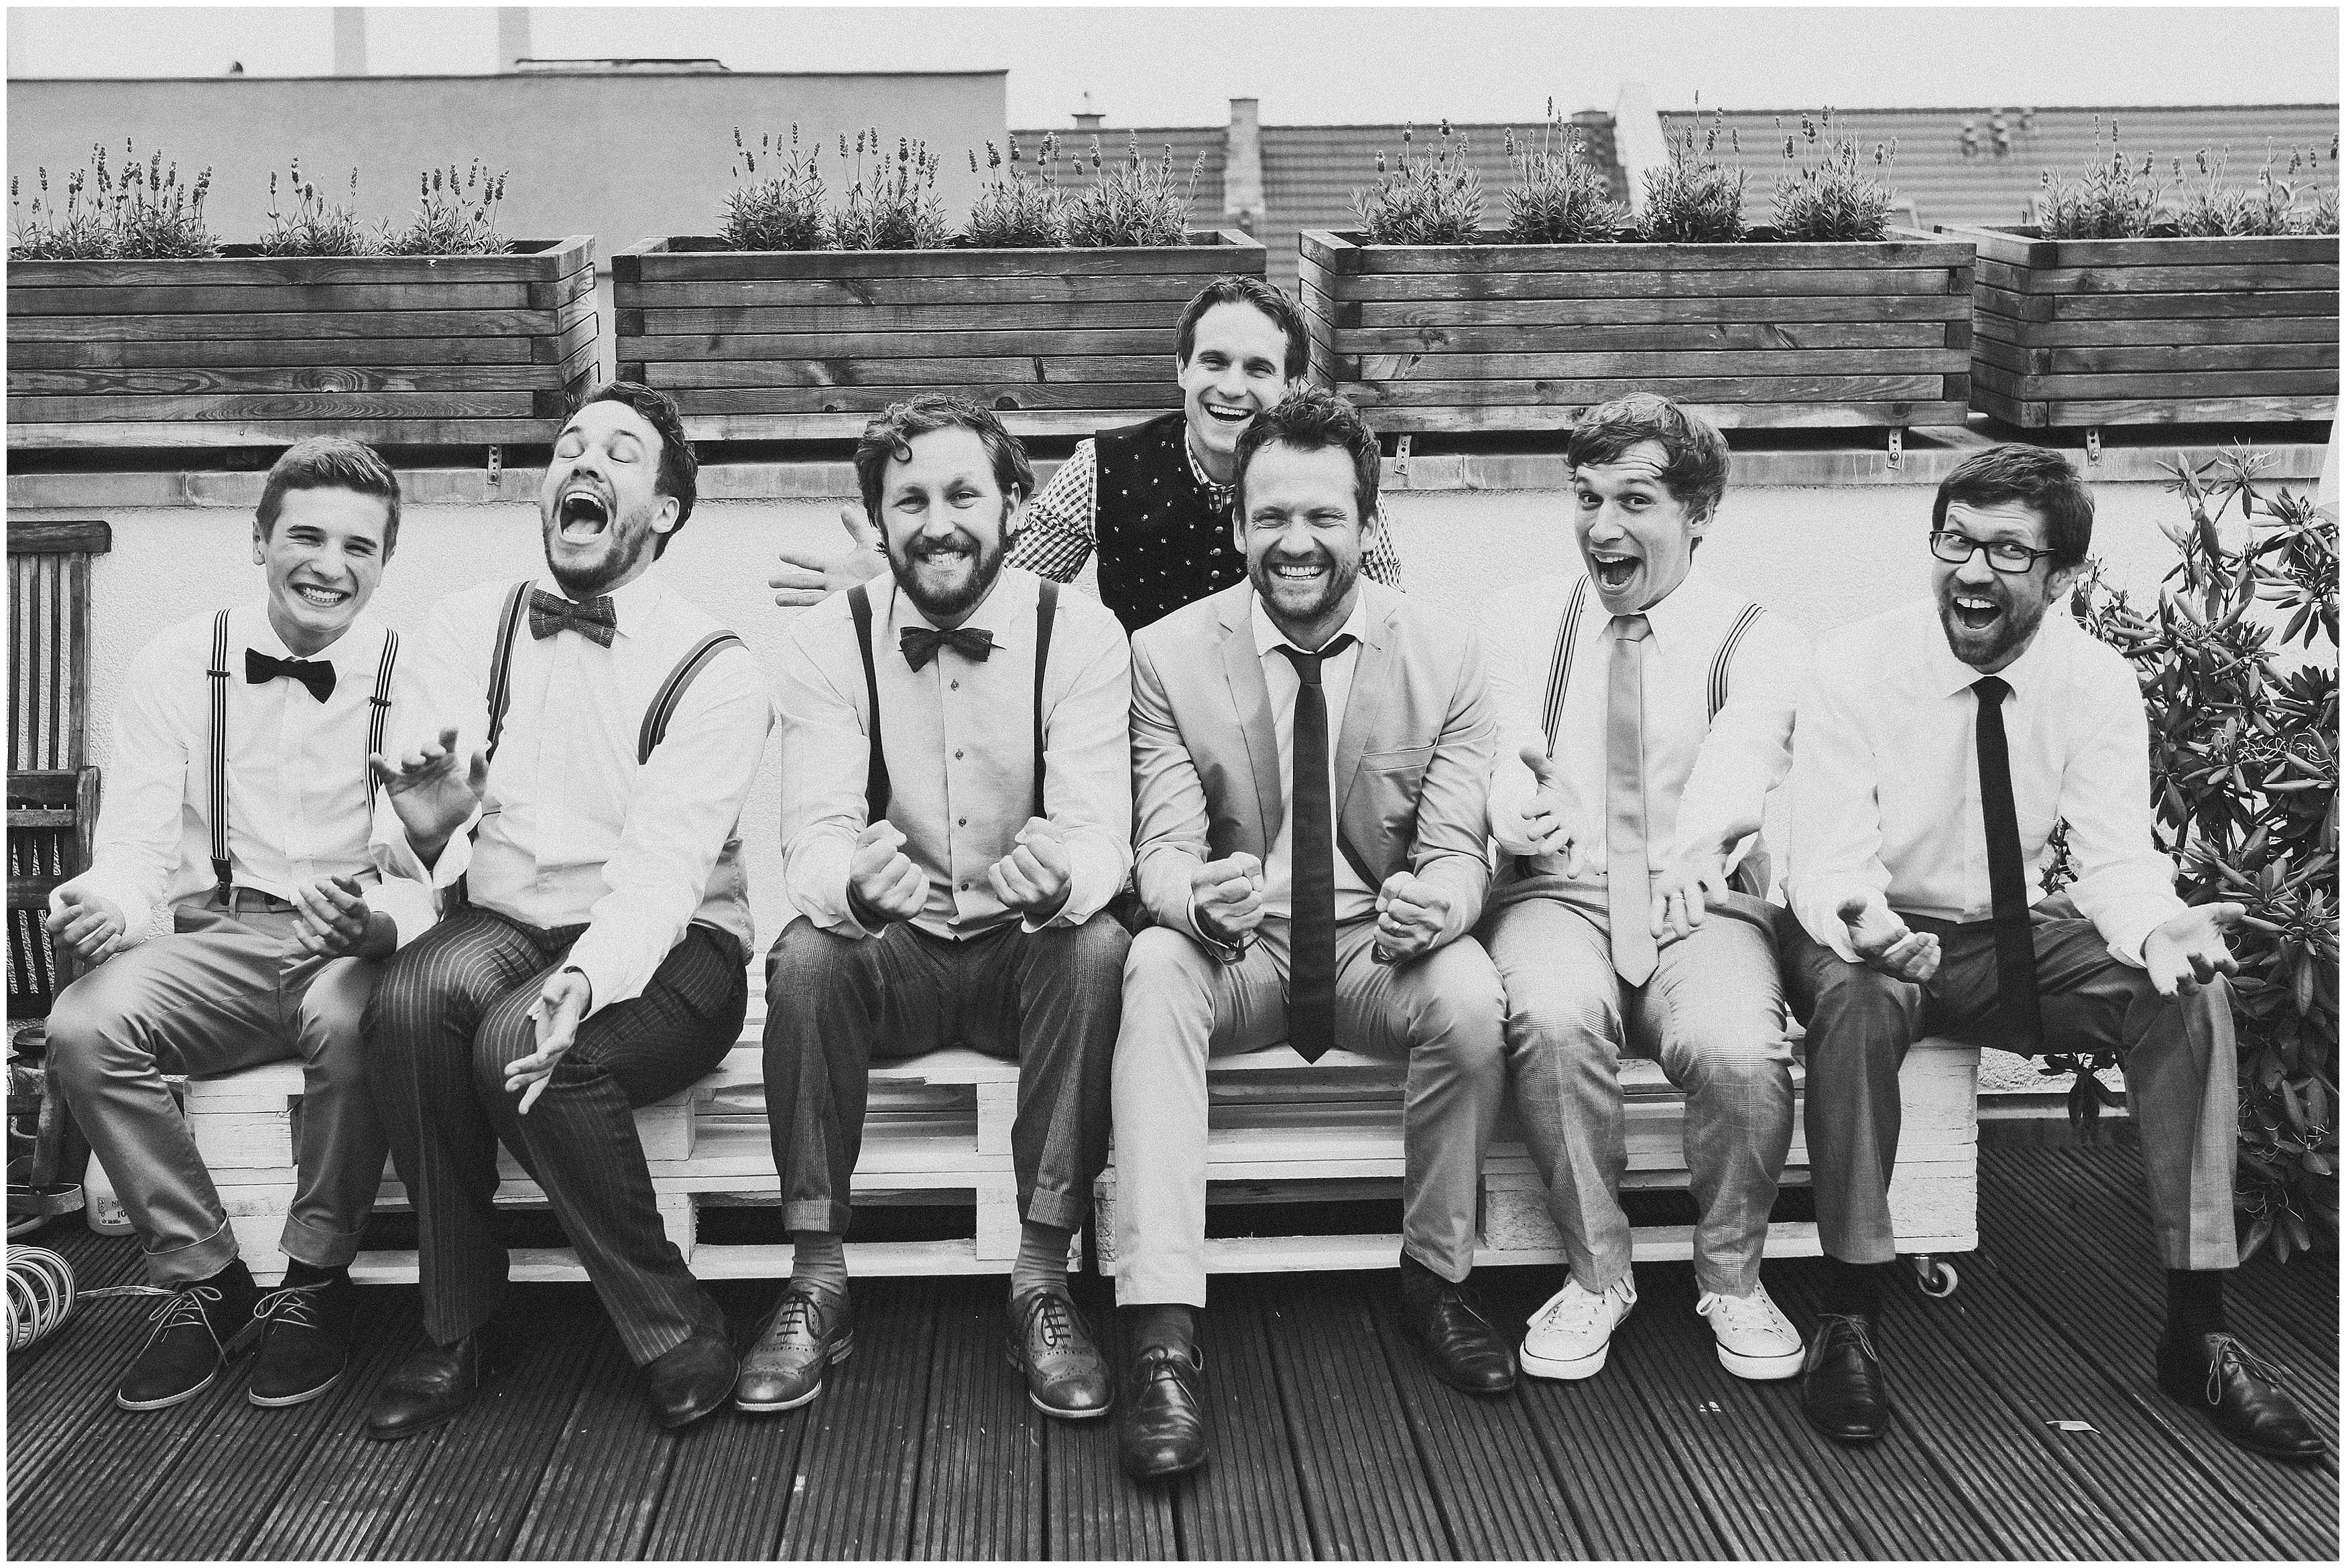 ivy&olive_Hochzeitsplanung_Nancy_Ebert_Fotografie_Vintage_Wedding_0014